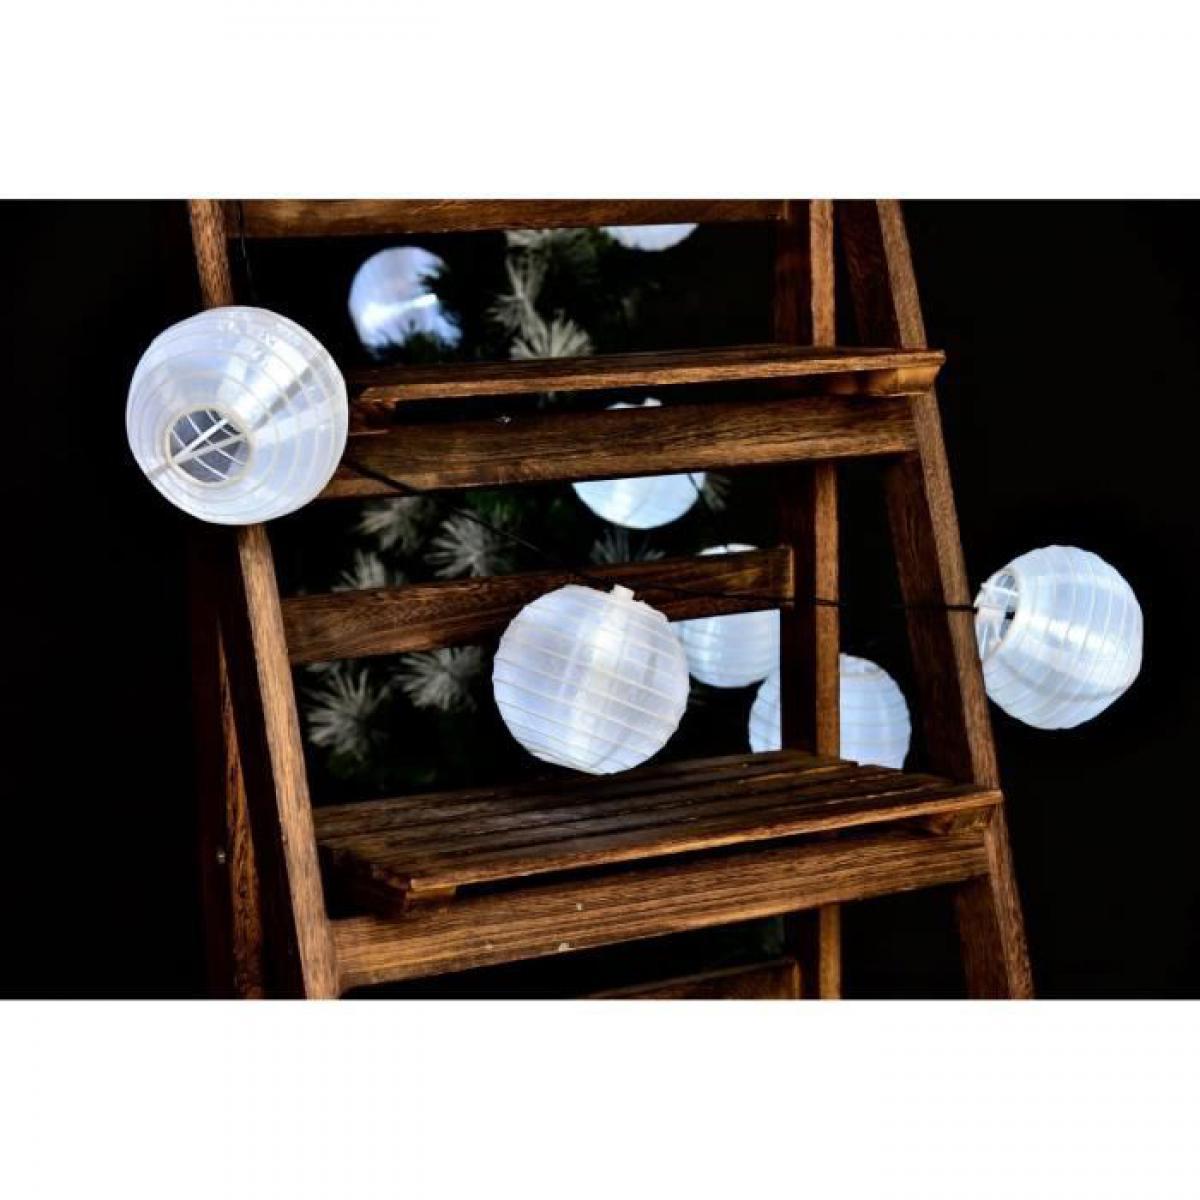 Lumi Jardin Lanternes guirlande lumineuse solaire 10 lampions a LED